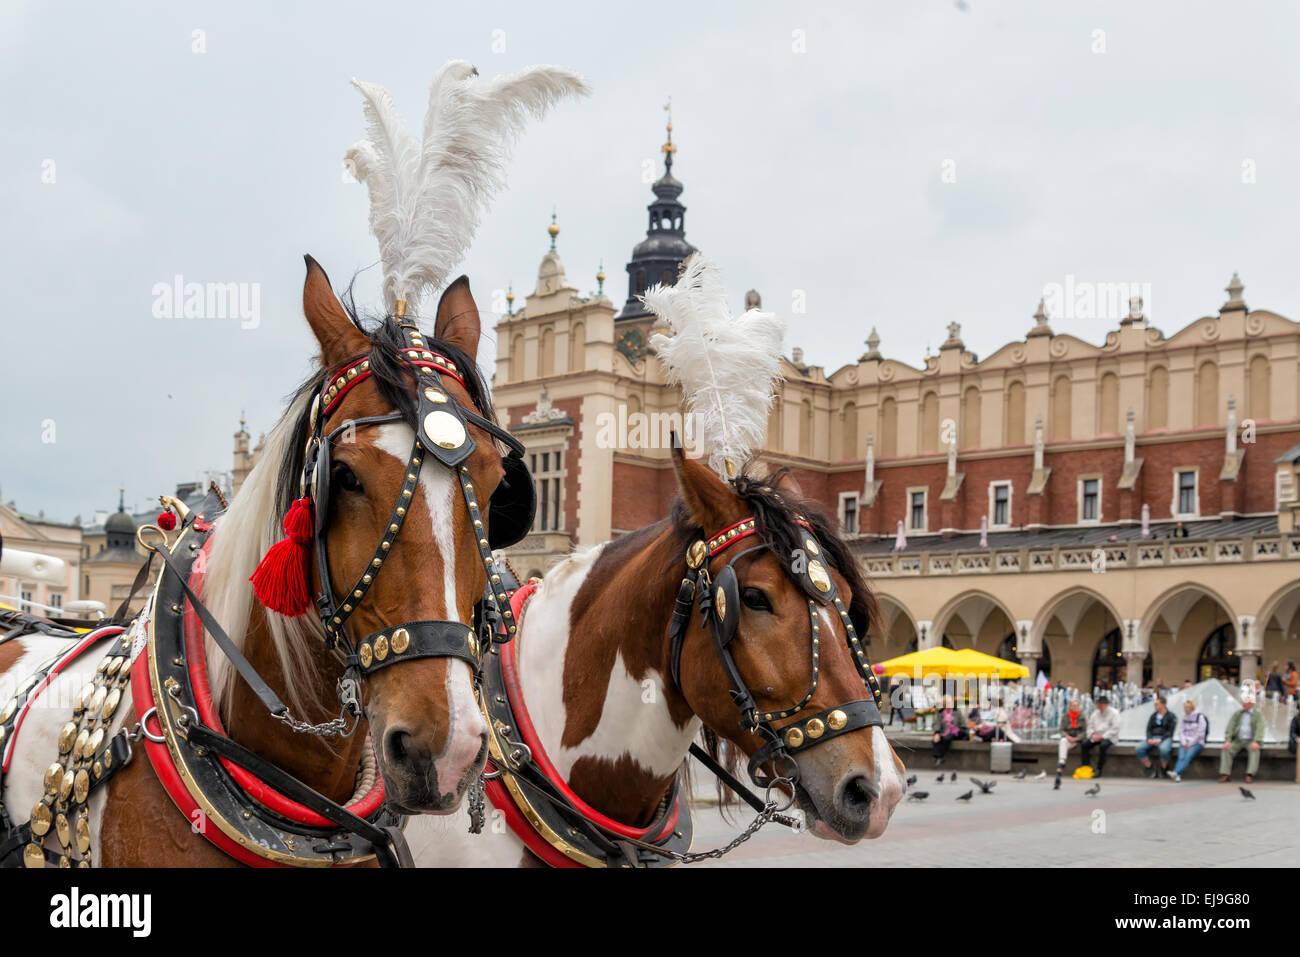 Horses in Krakow Stock Photo